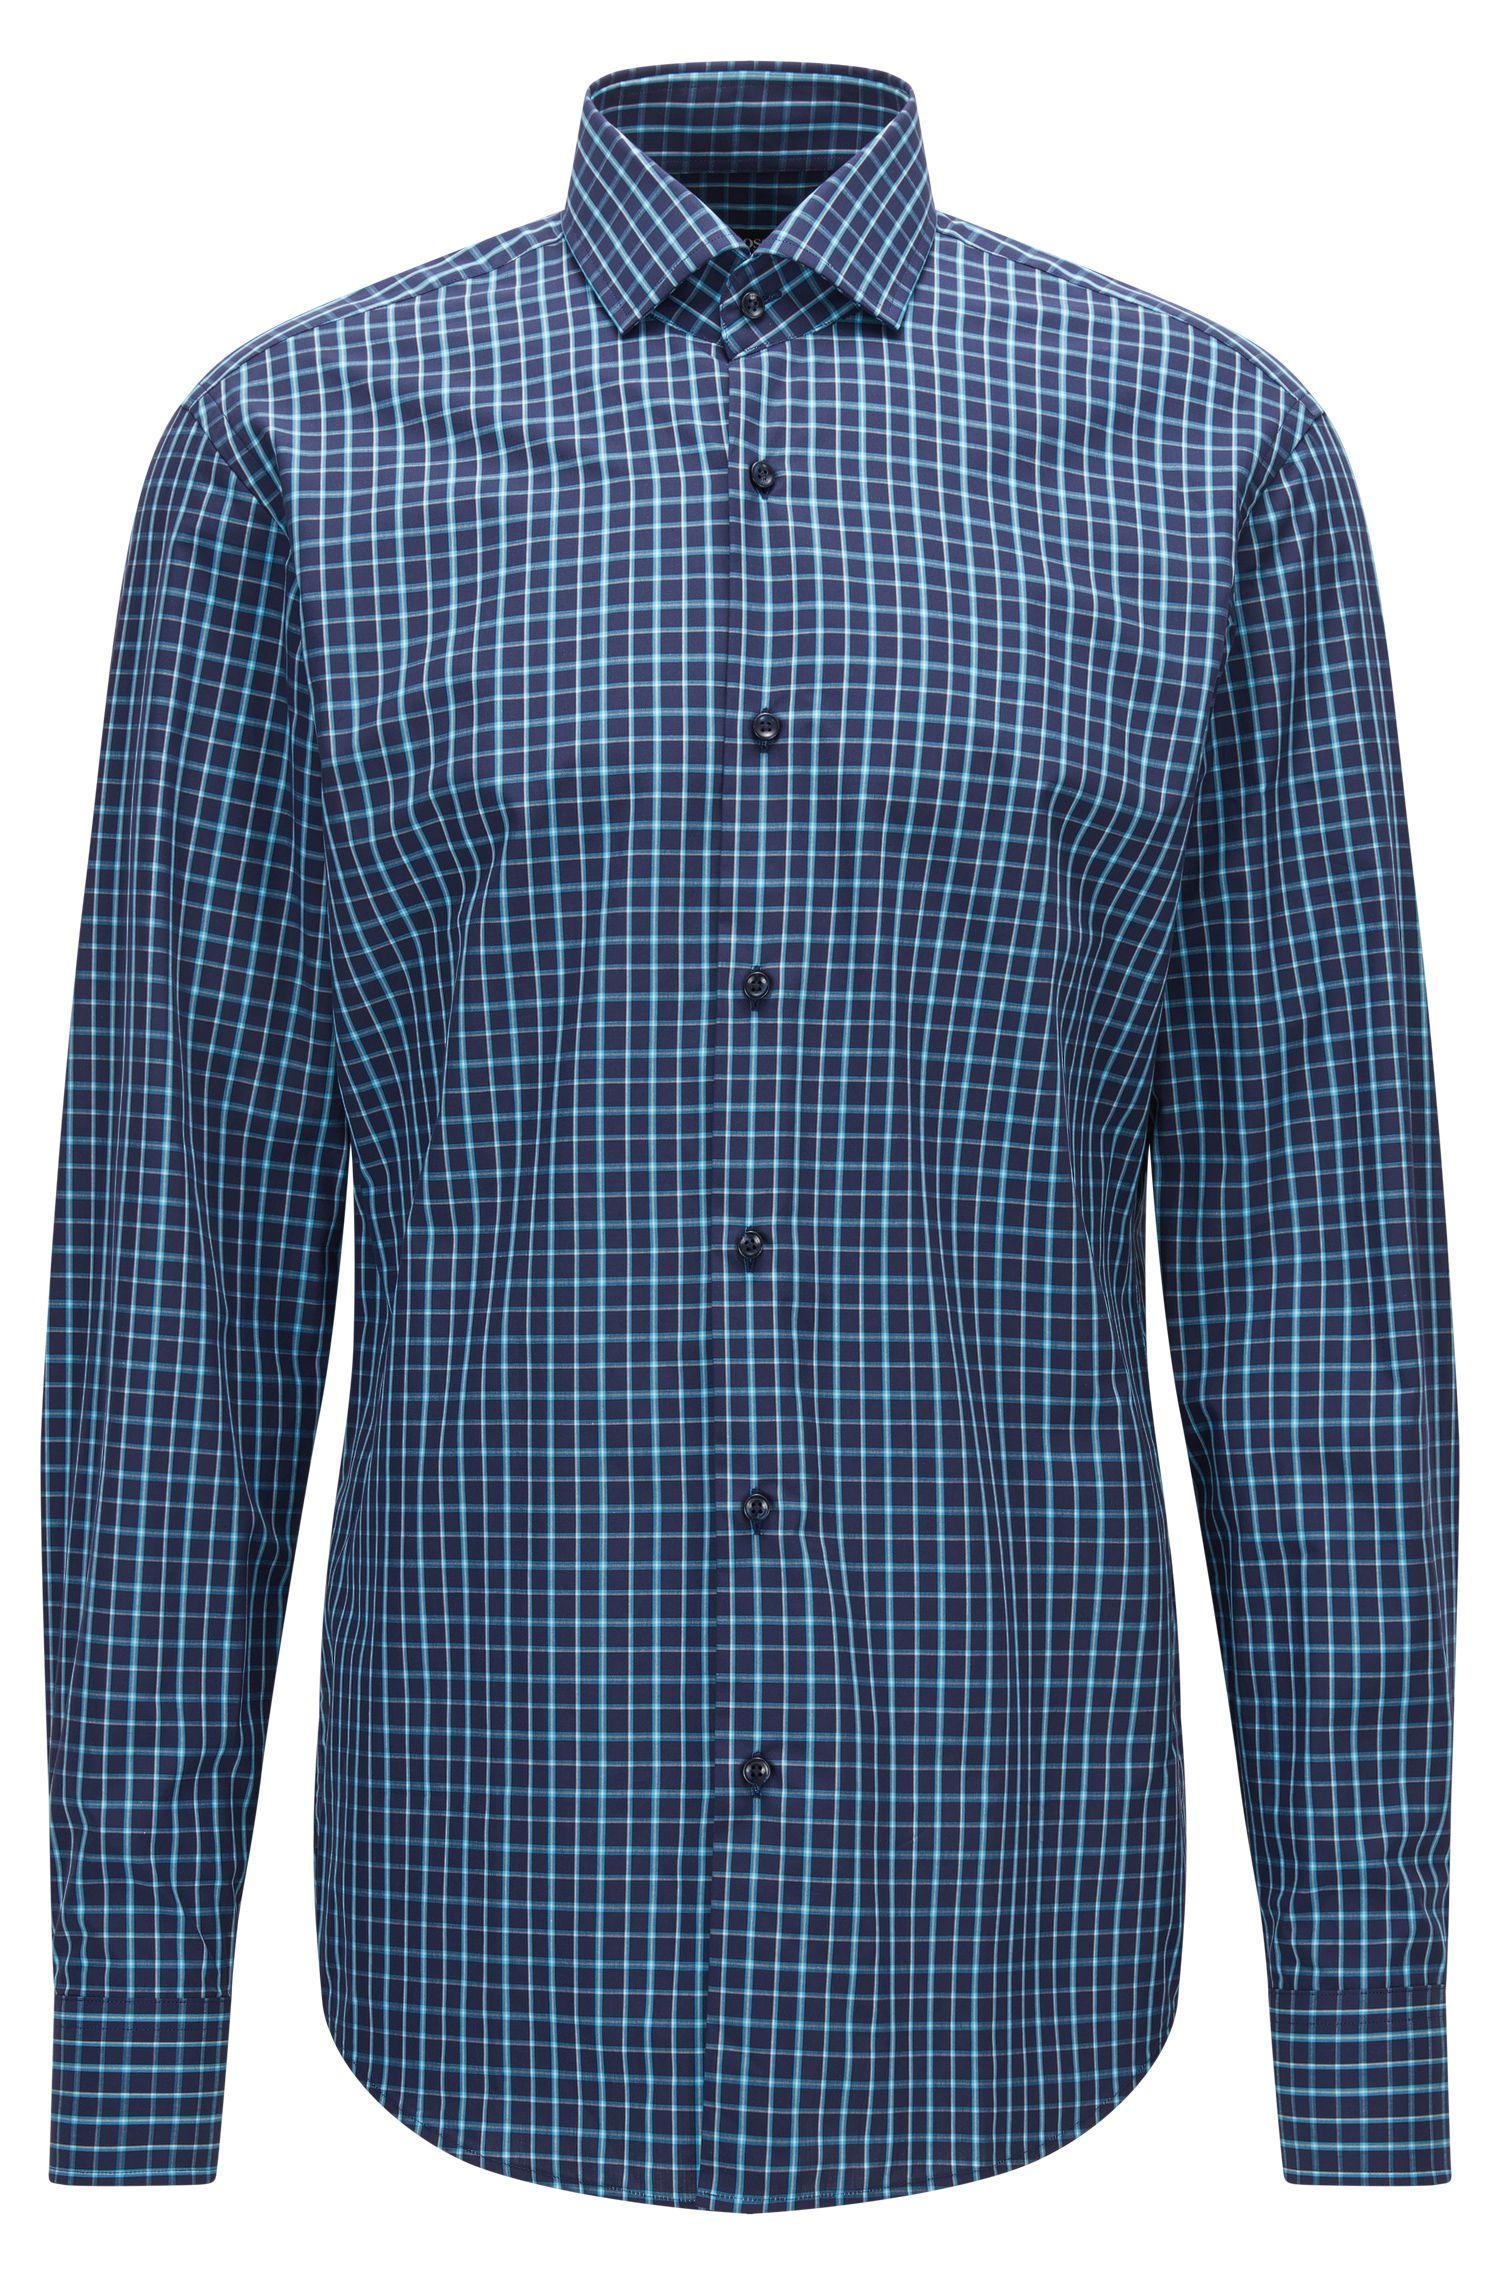 Double Windowpane Cotton Dress Shirt, Regular Fit   Gordon